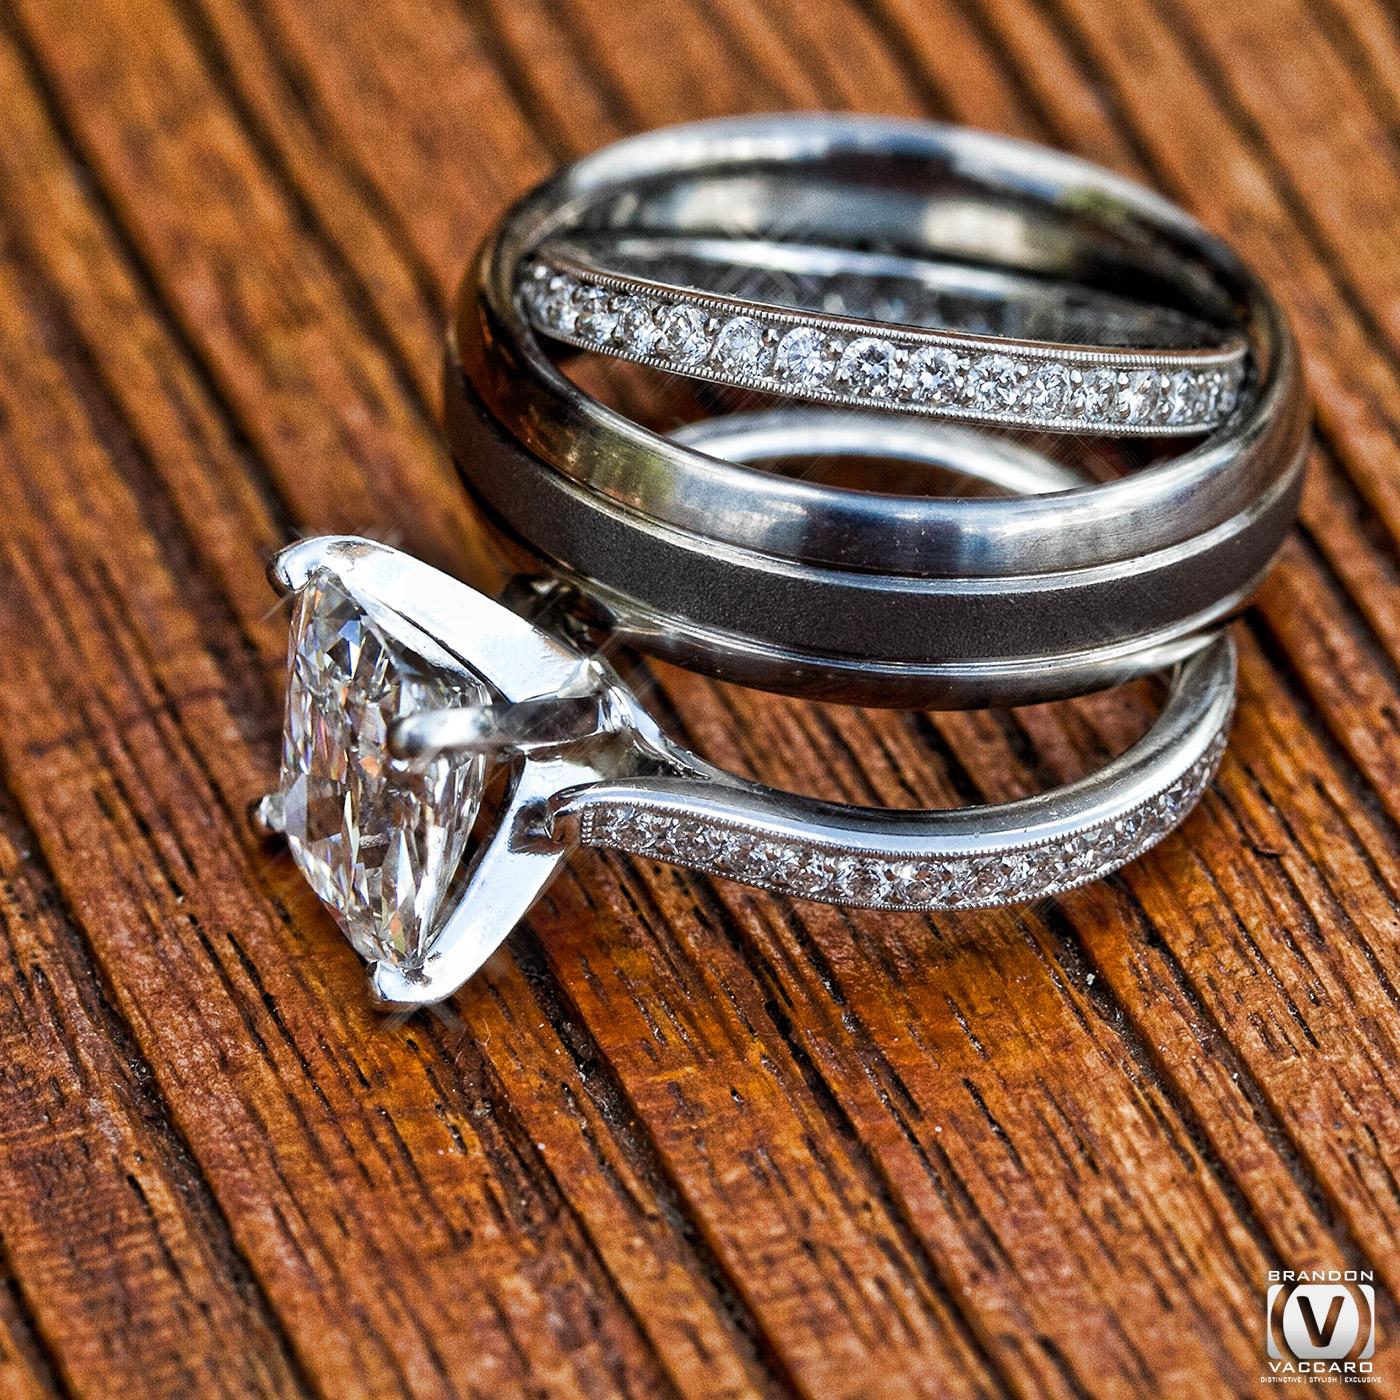 real-wedding-diamond-ring.jpg